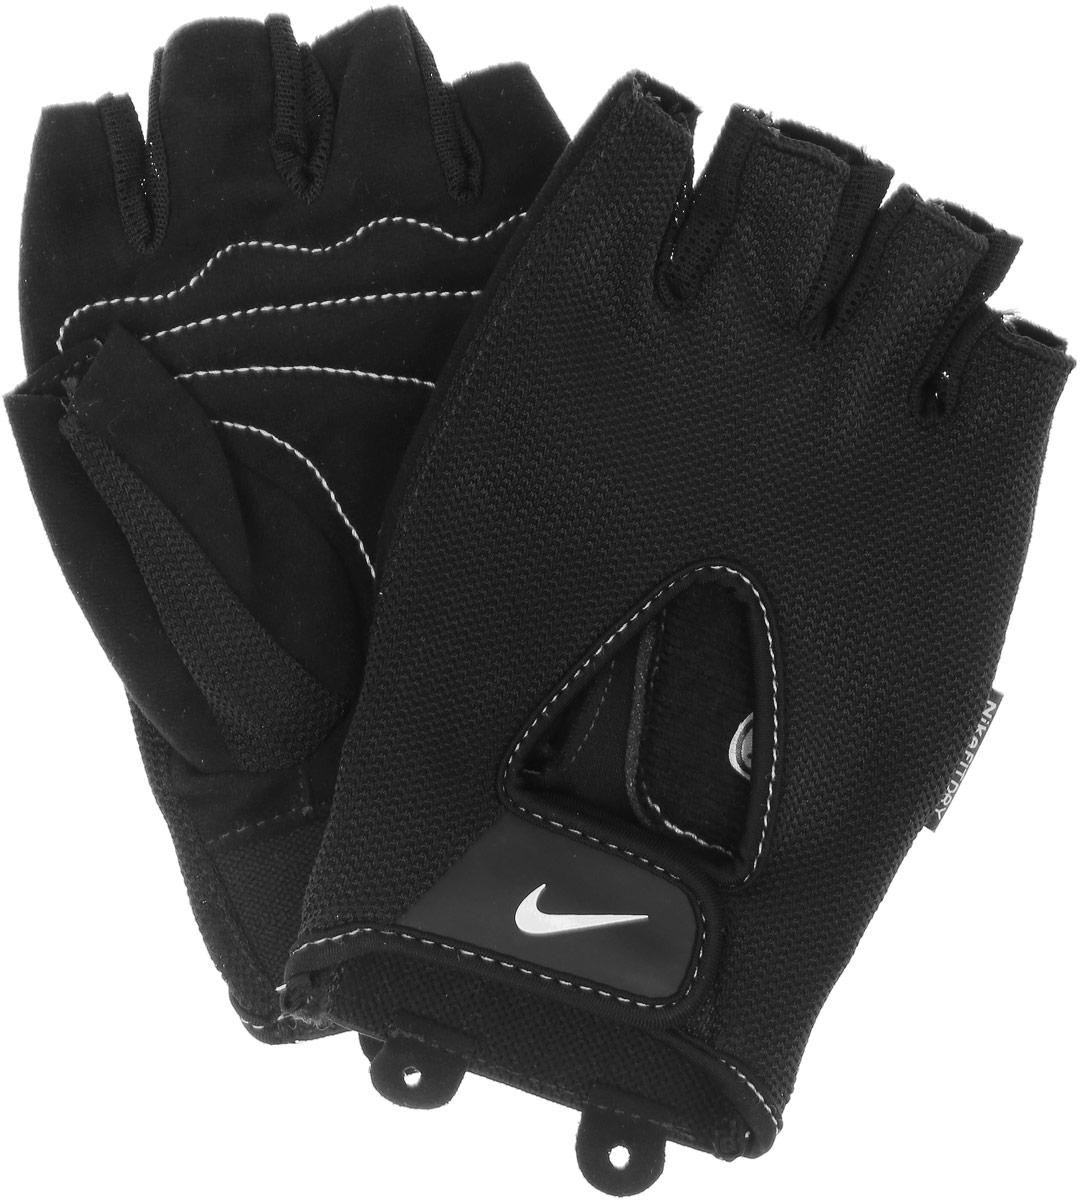 Перчатки для фитнеса мужские Nike Men's Fundamental Training Gloves, цвет: черный, белый. Размер M nike перчатки для фитнеса женские nike accessories